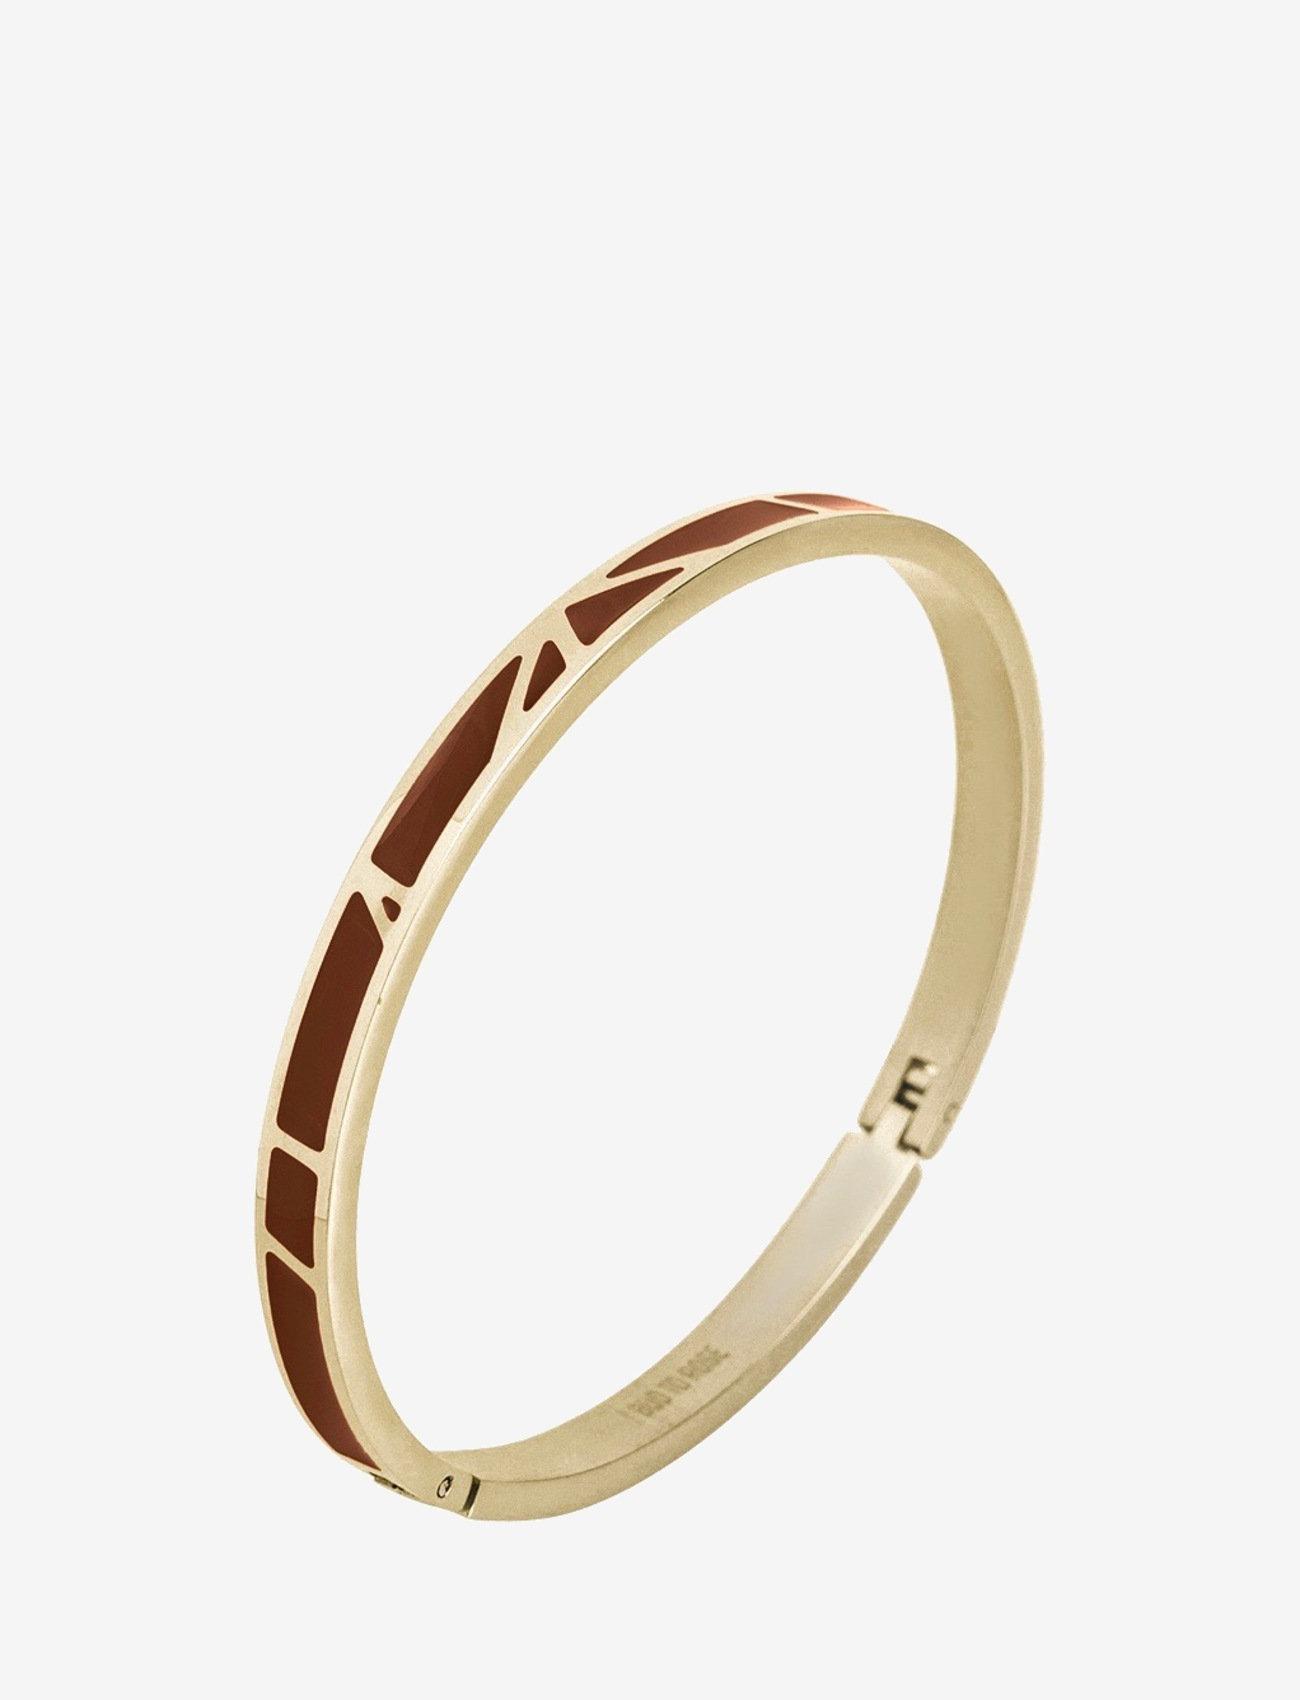 Bud to rose - Rose Enamel Bangle Brown/Gold - bangles - gold - 0